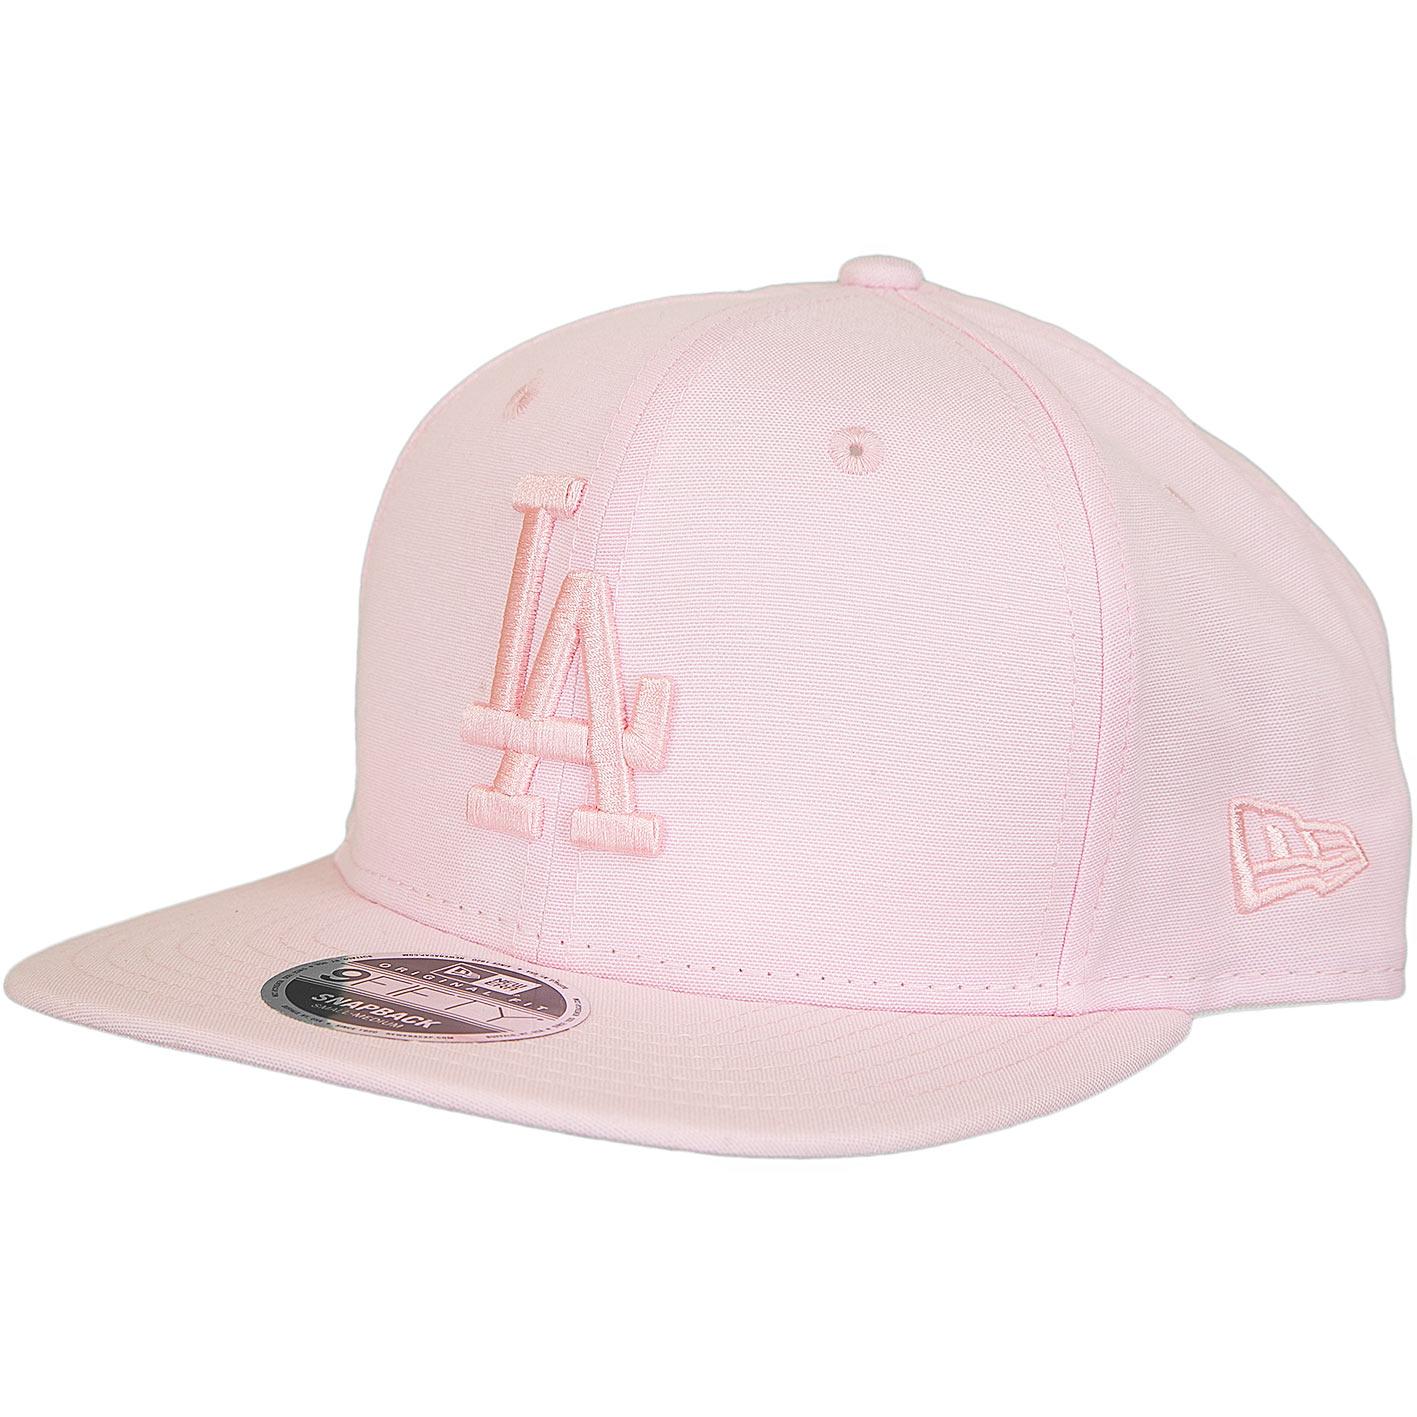 bd8a5a10ed0171 ☆ New Era 9Fifty Snapback Cap Oxford L.A.Dodgers pink - hier bestellen!